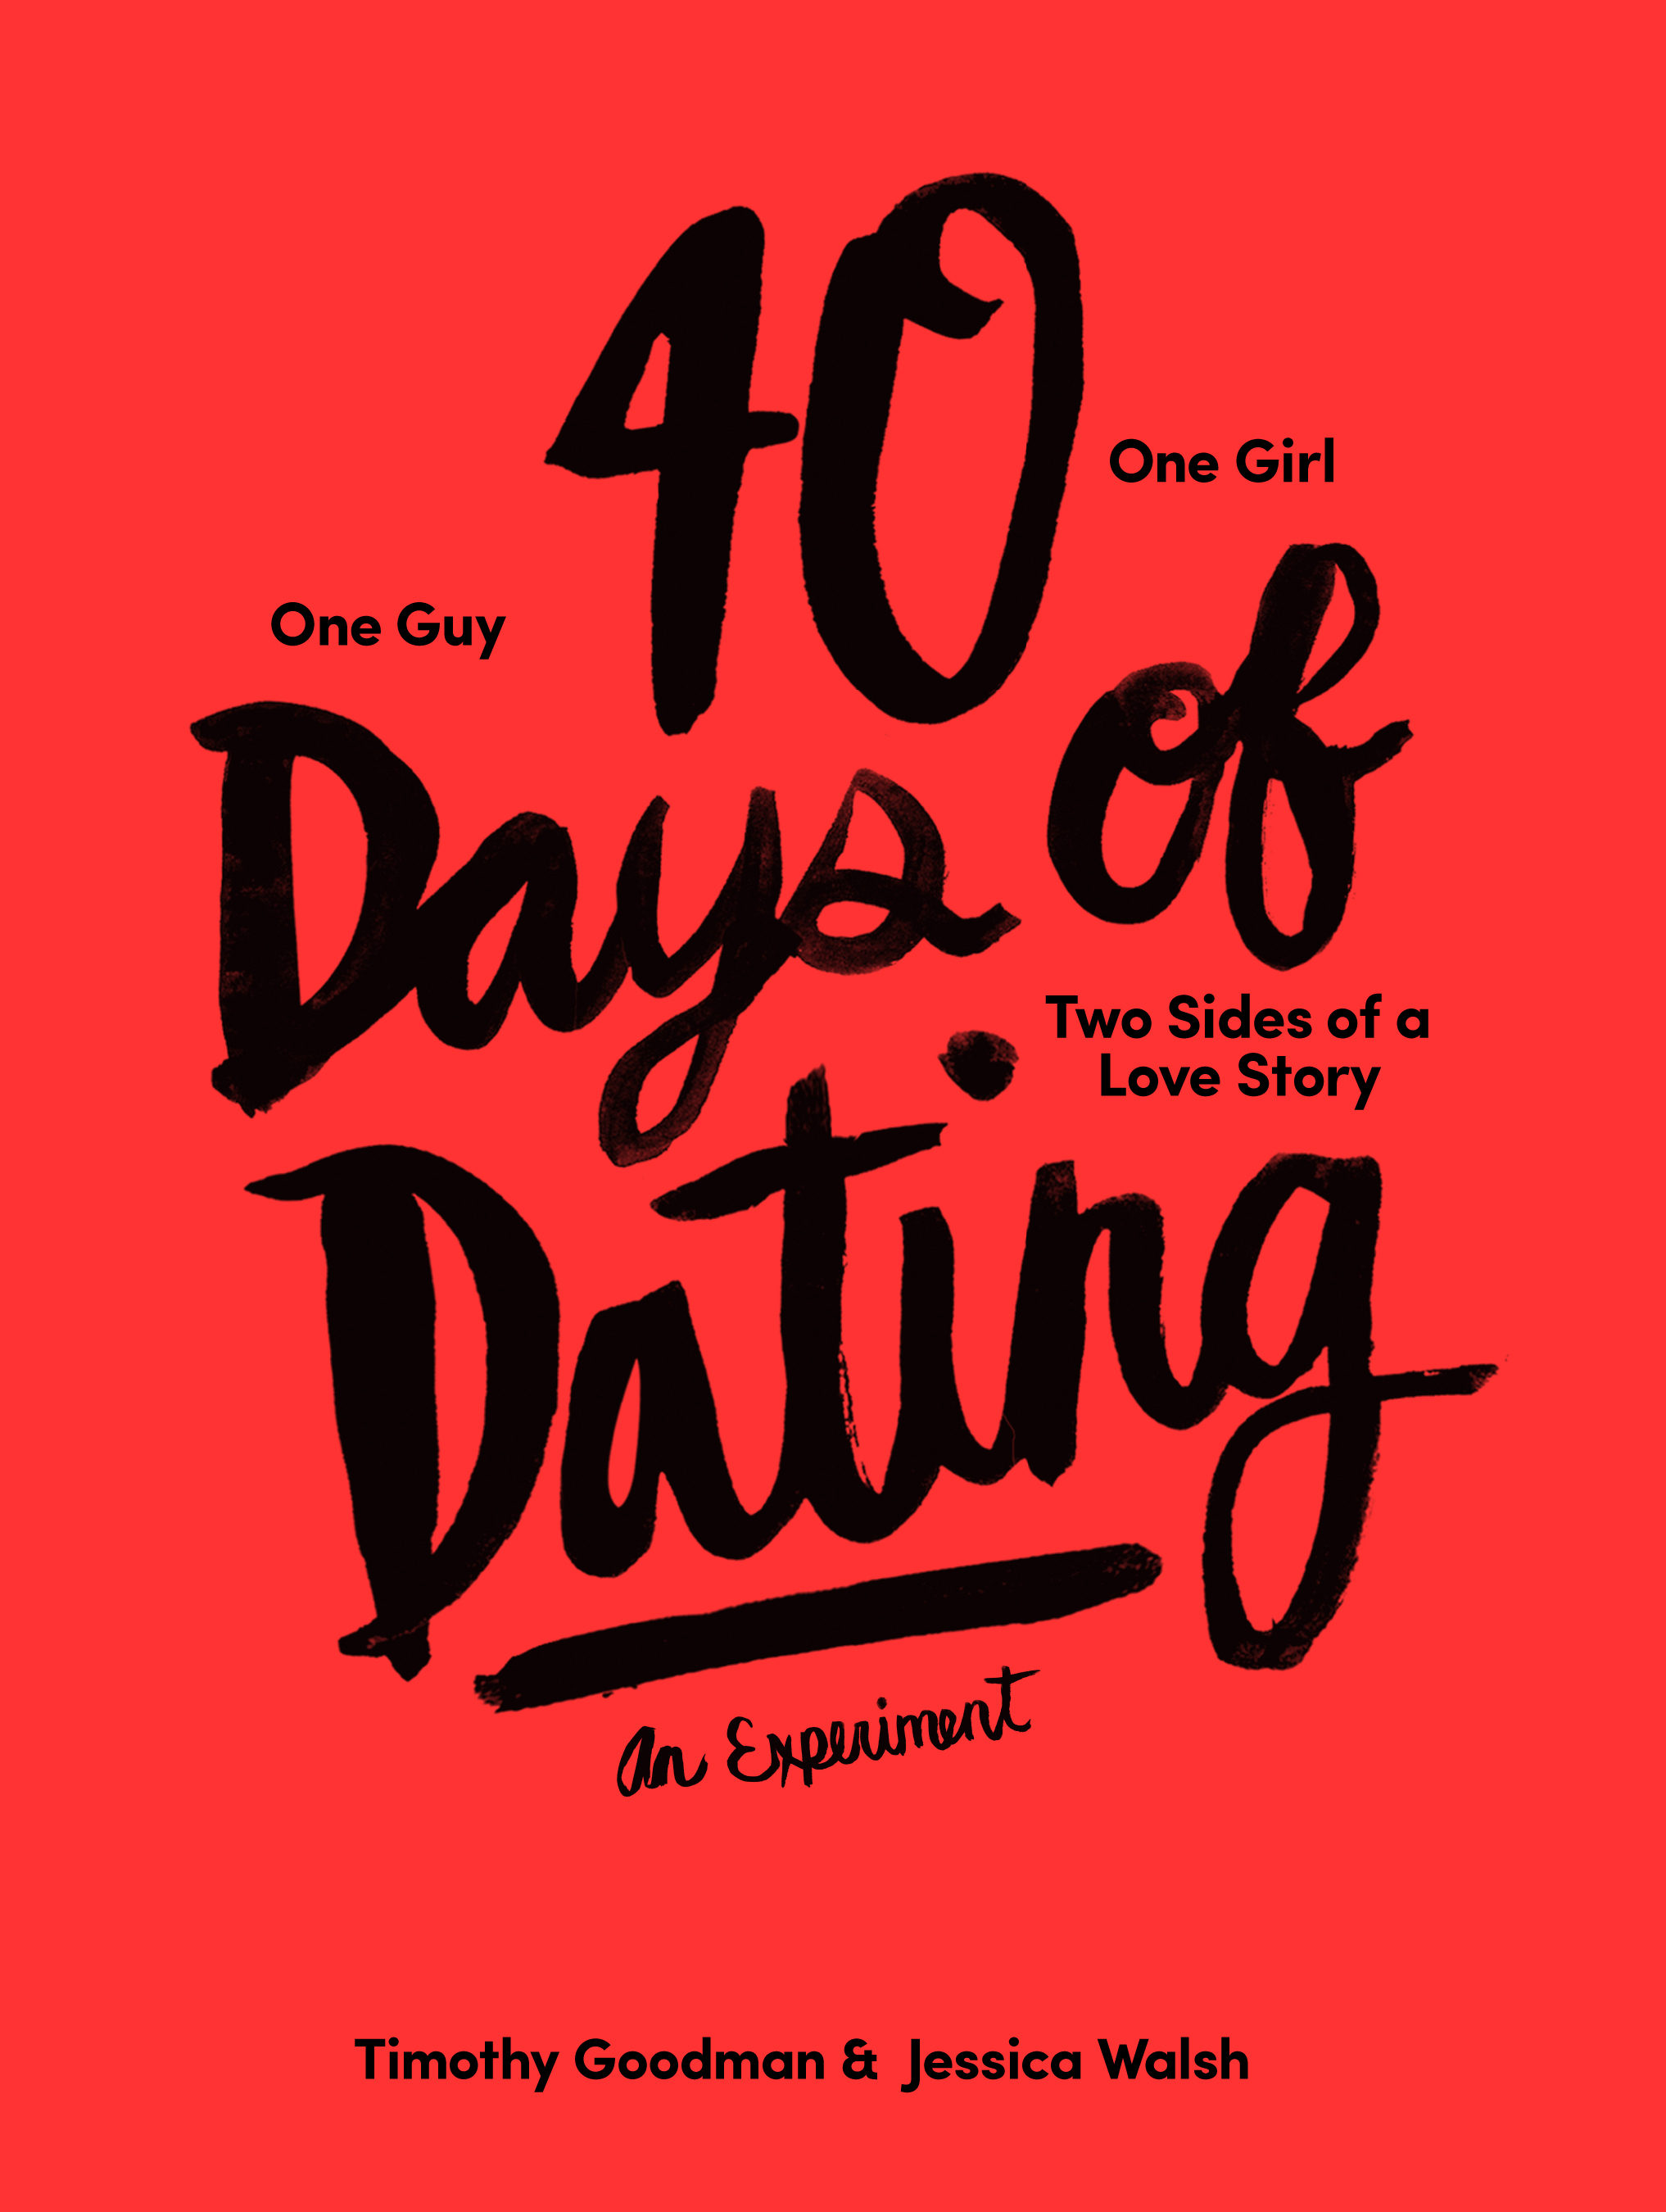 40 days of dating still friends